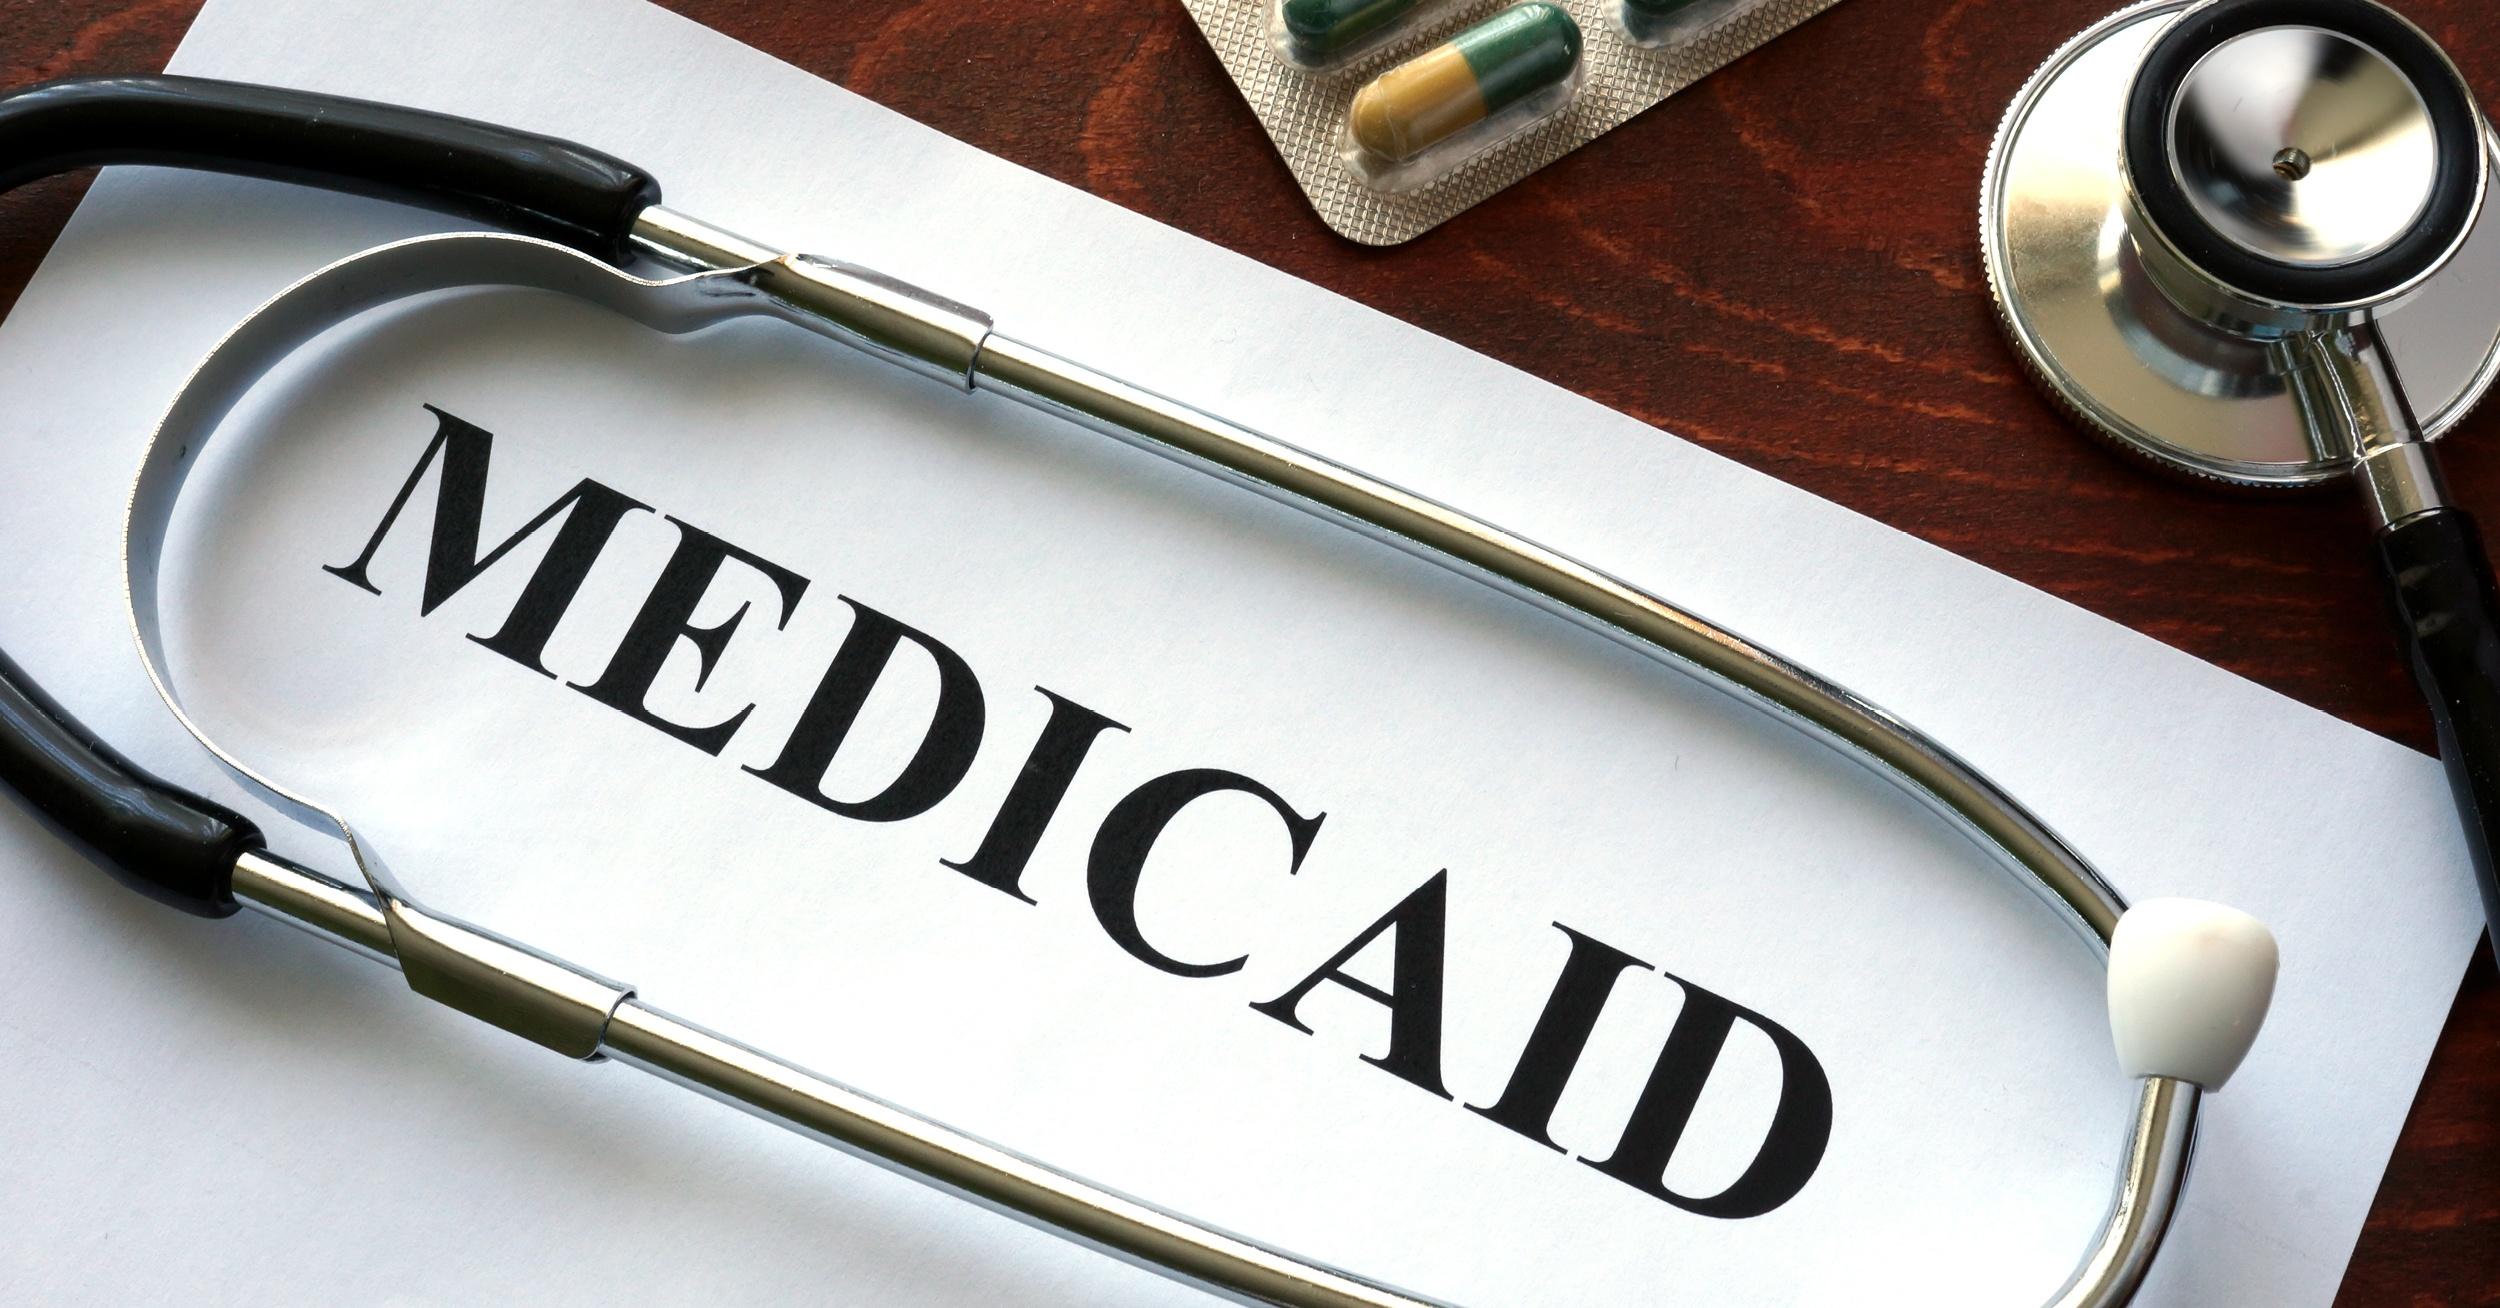 AIM Favors PA Legislation to Help EMS Services